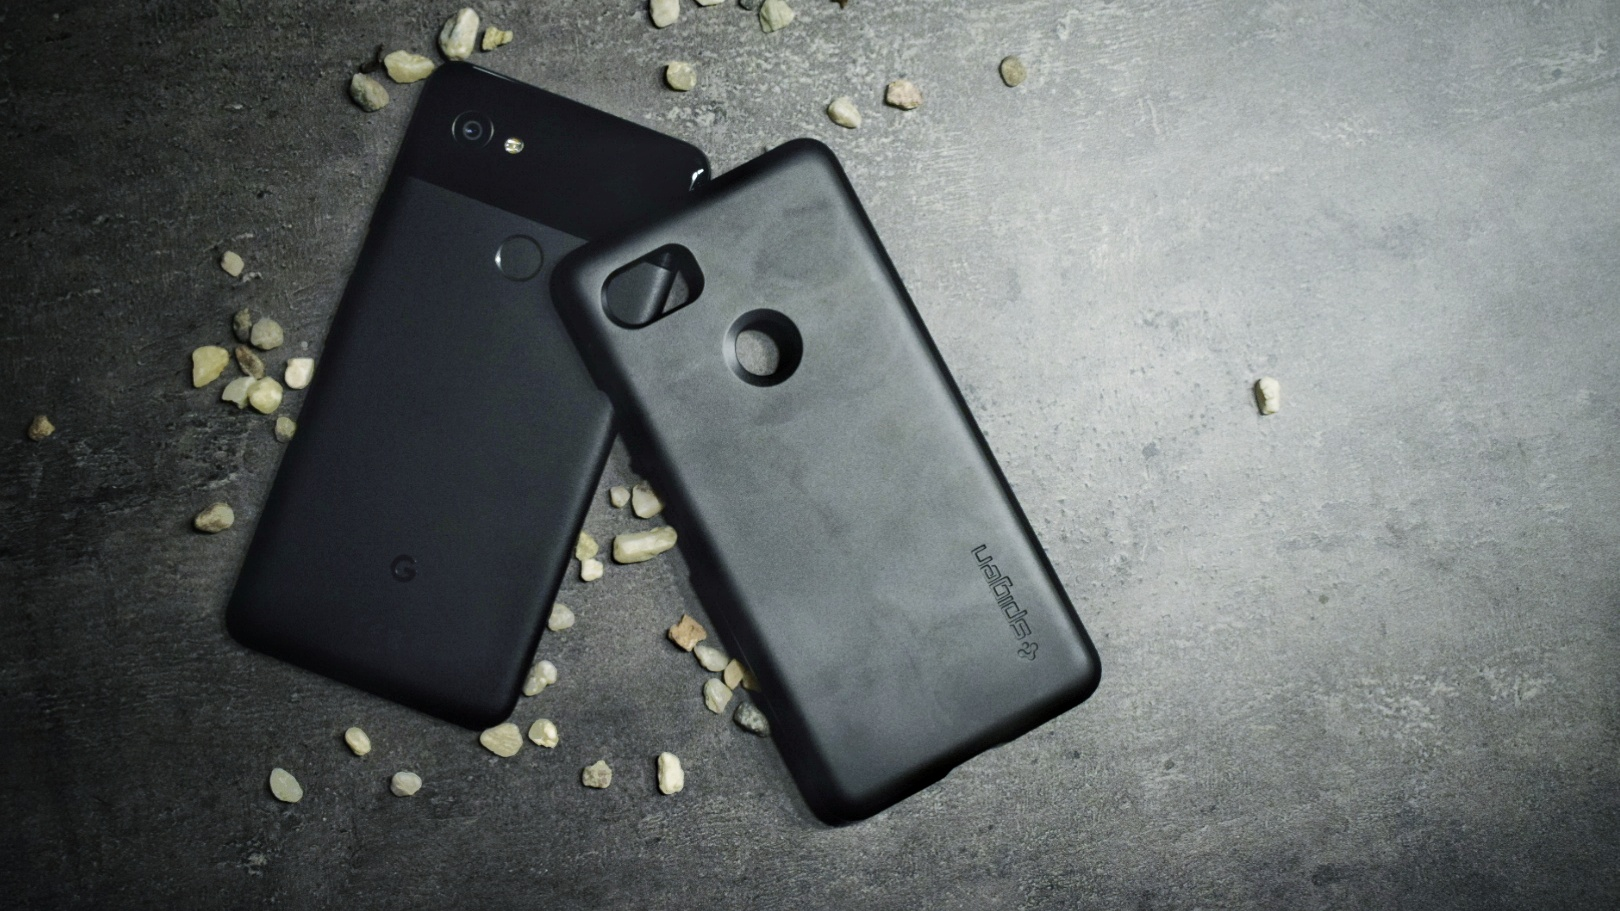 google-pixel-2-xl-spigen-case